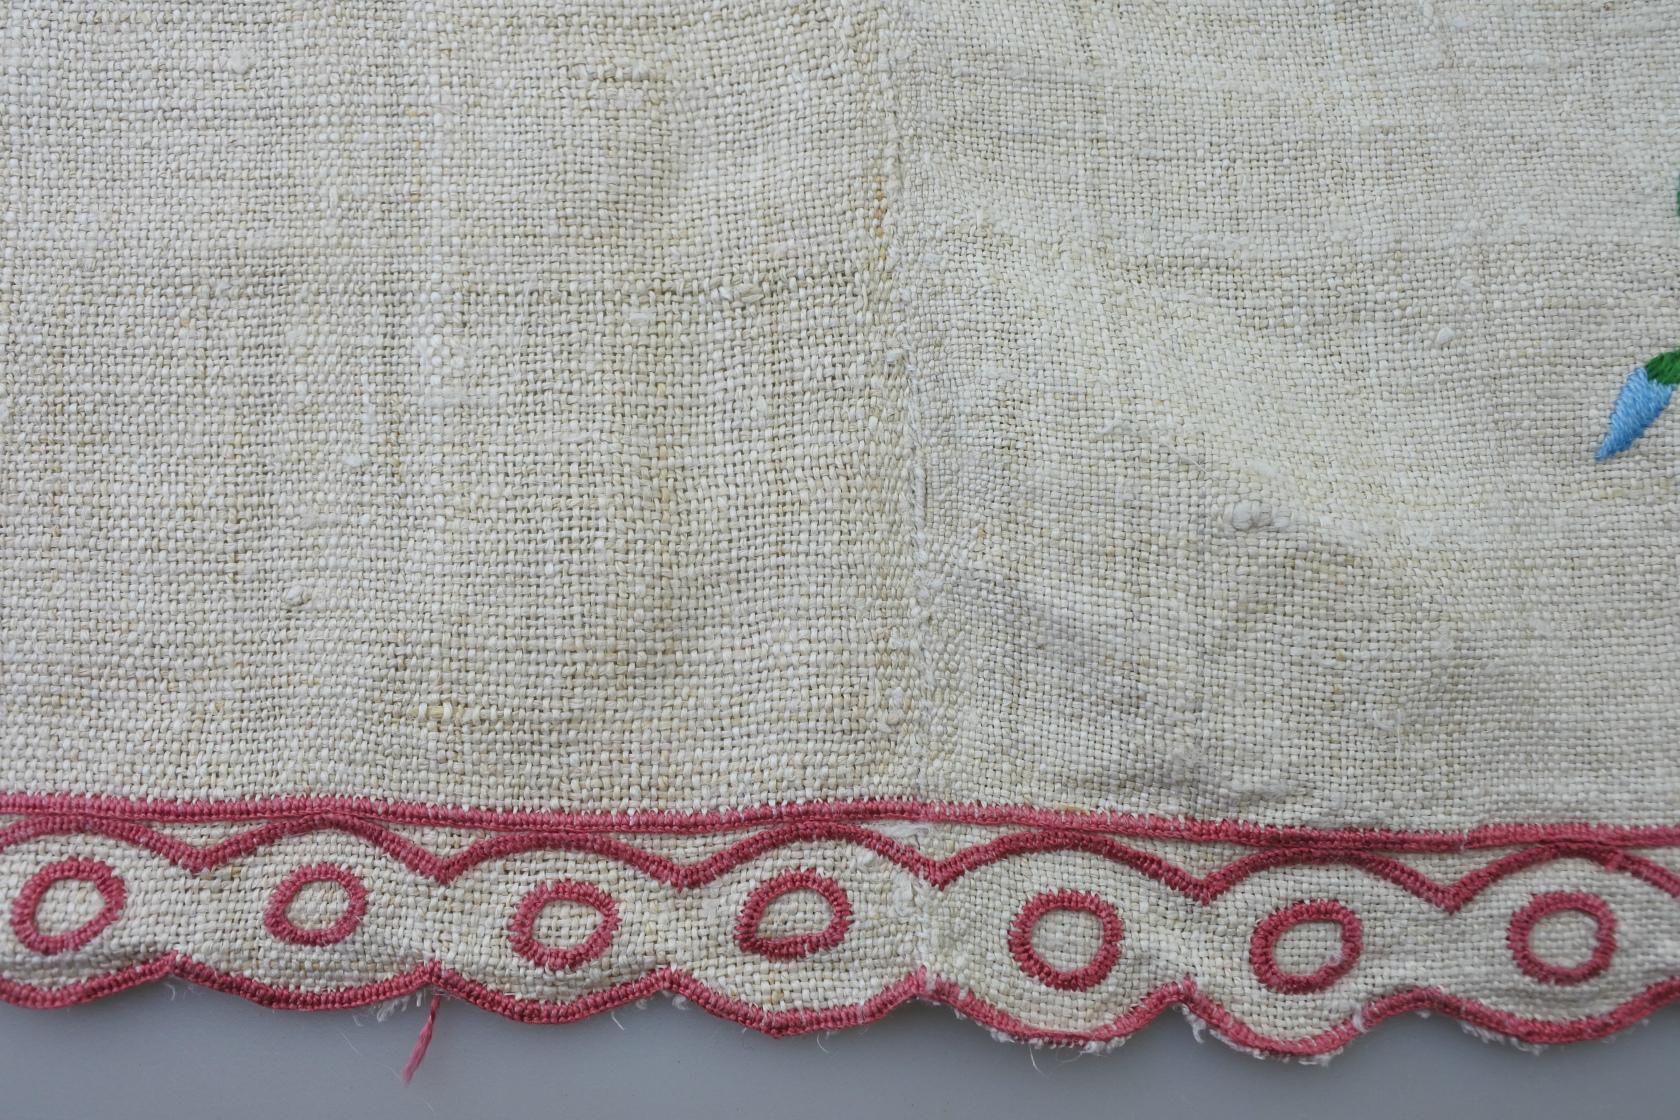 vi-fr-embroidered-c